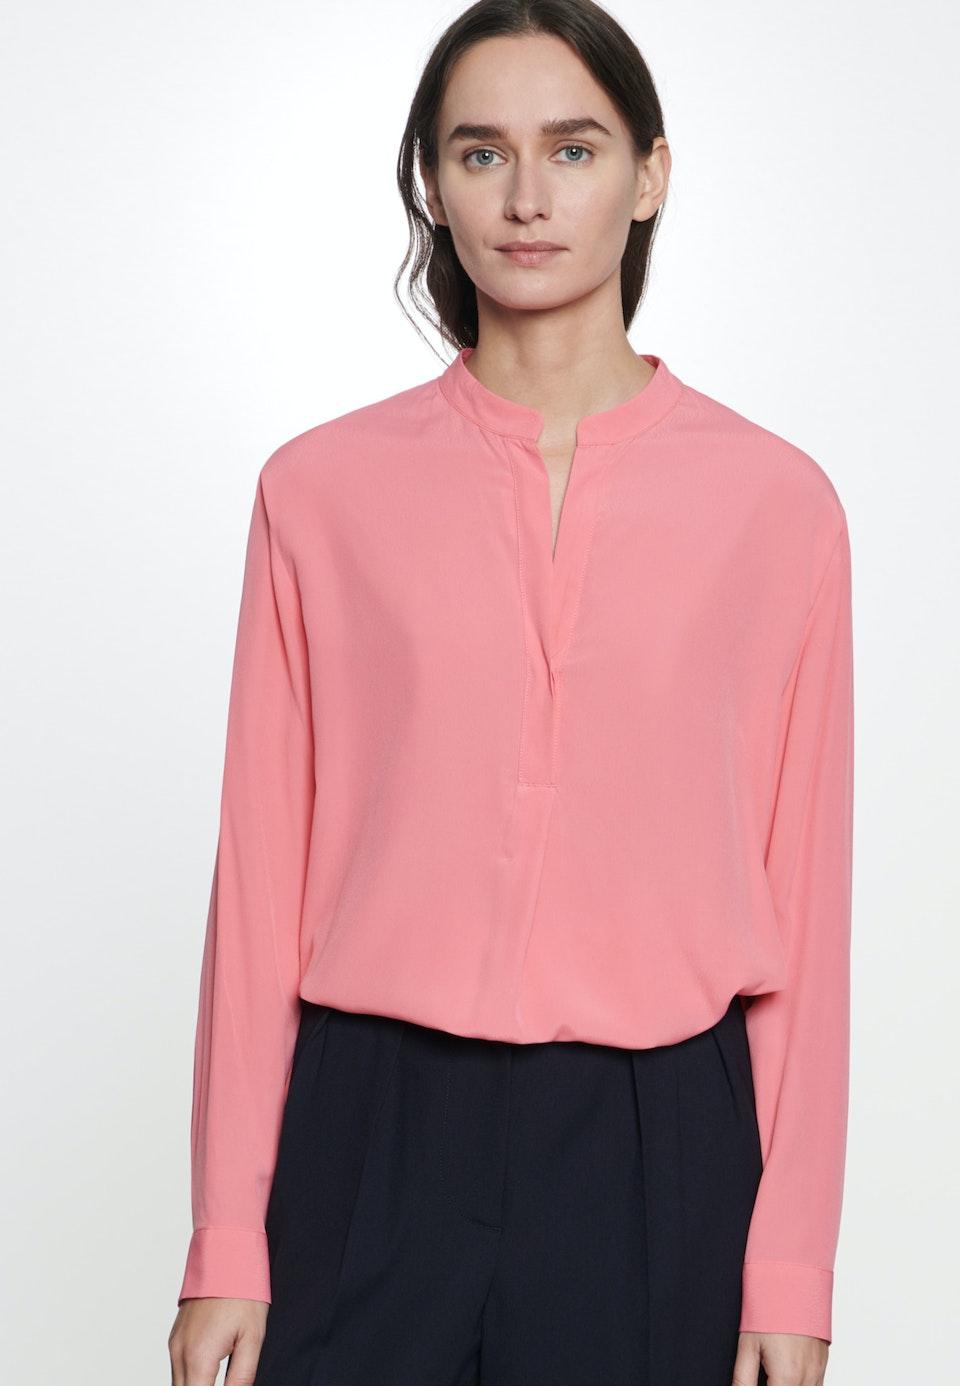 Twill Slip Over Blouse made of 100% Viscose in Pink |  Seidensticker Onlineshop